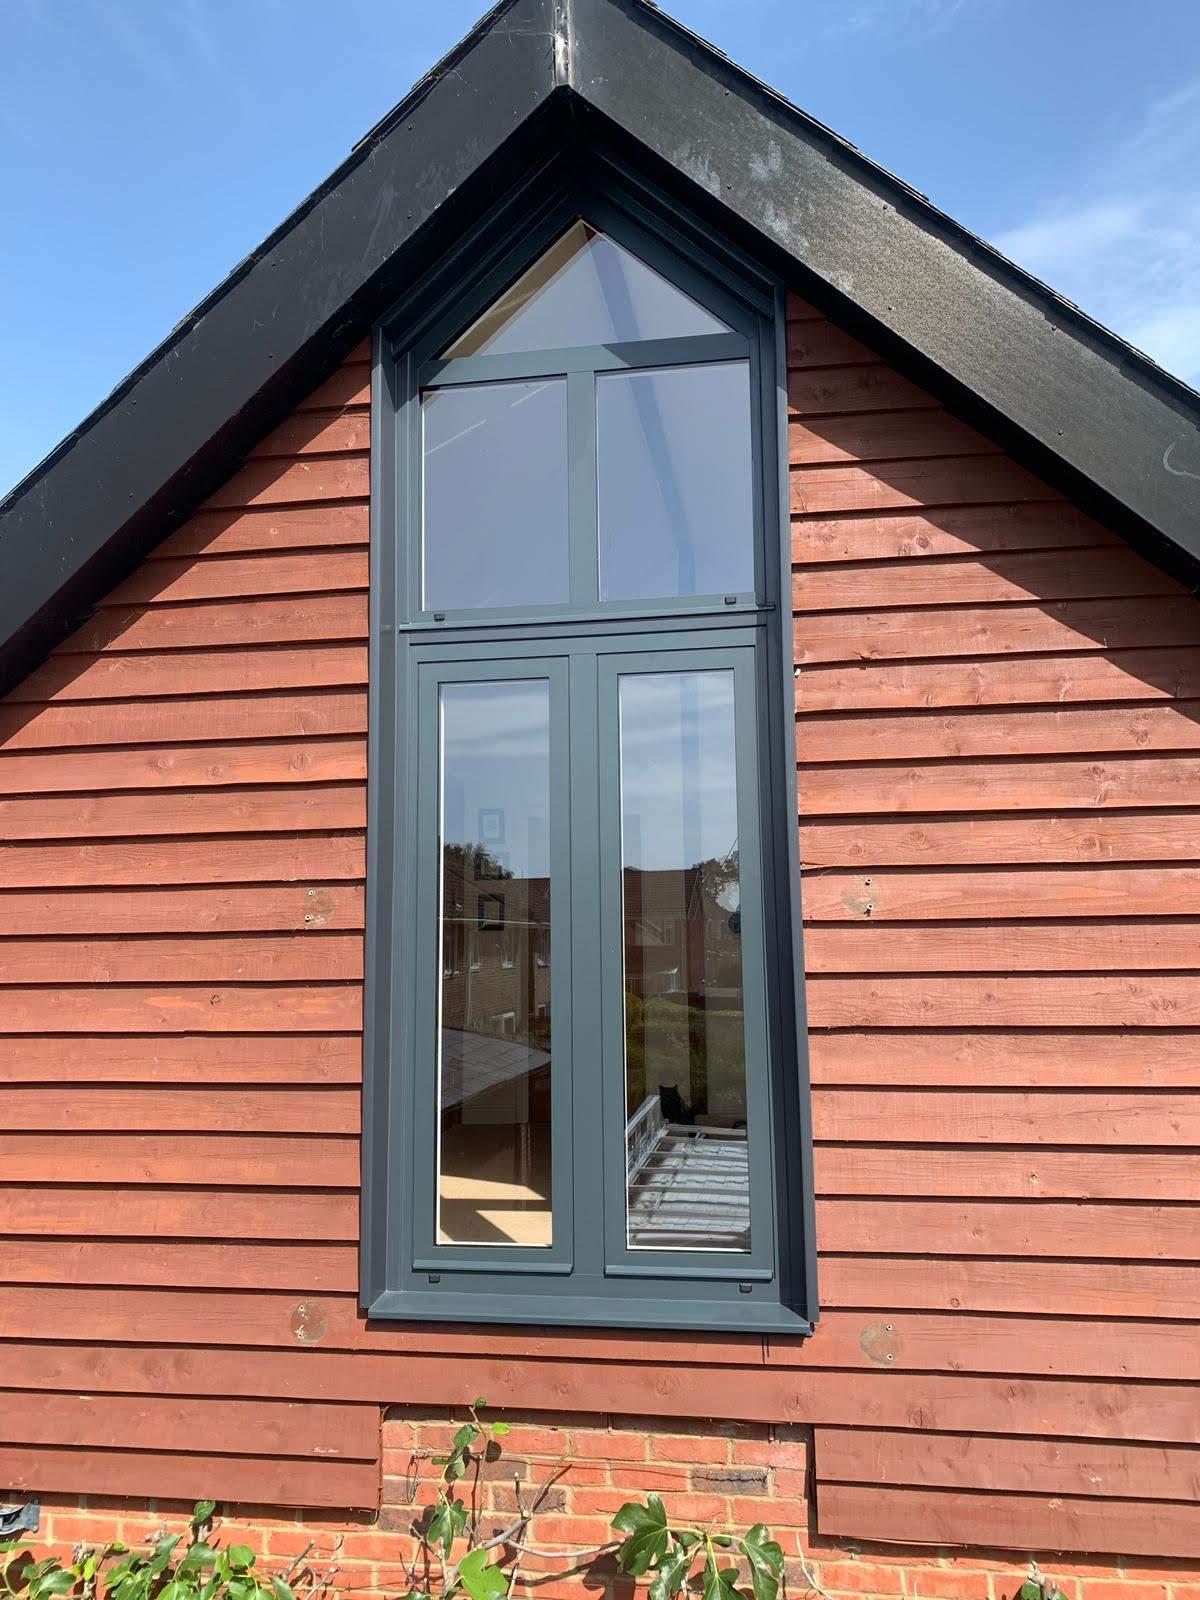 Front view of a new aluminium window design.